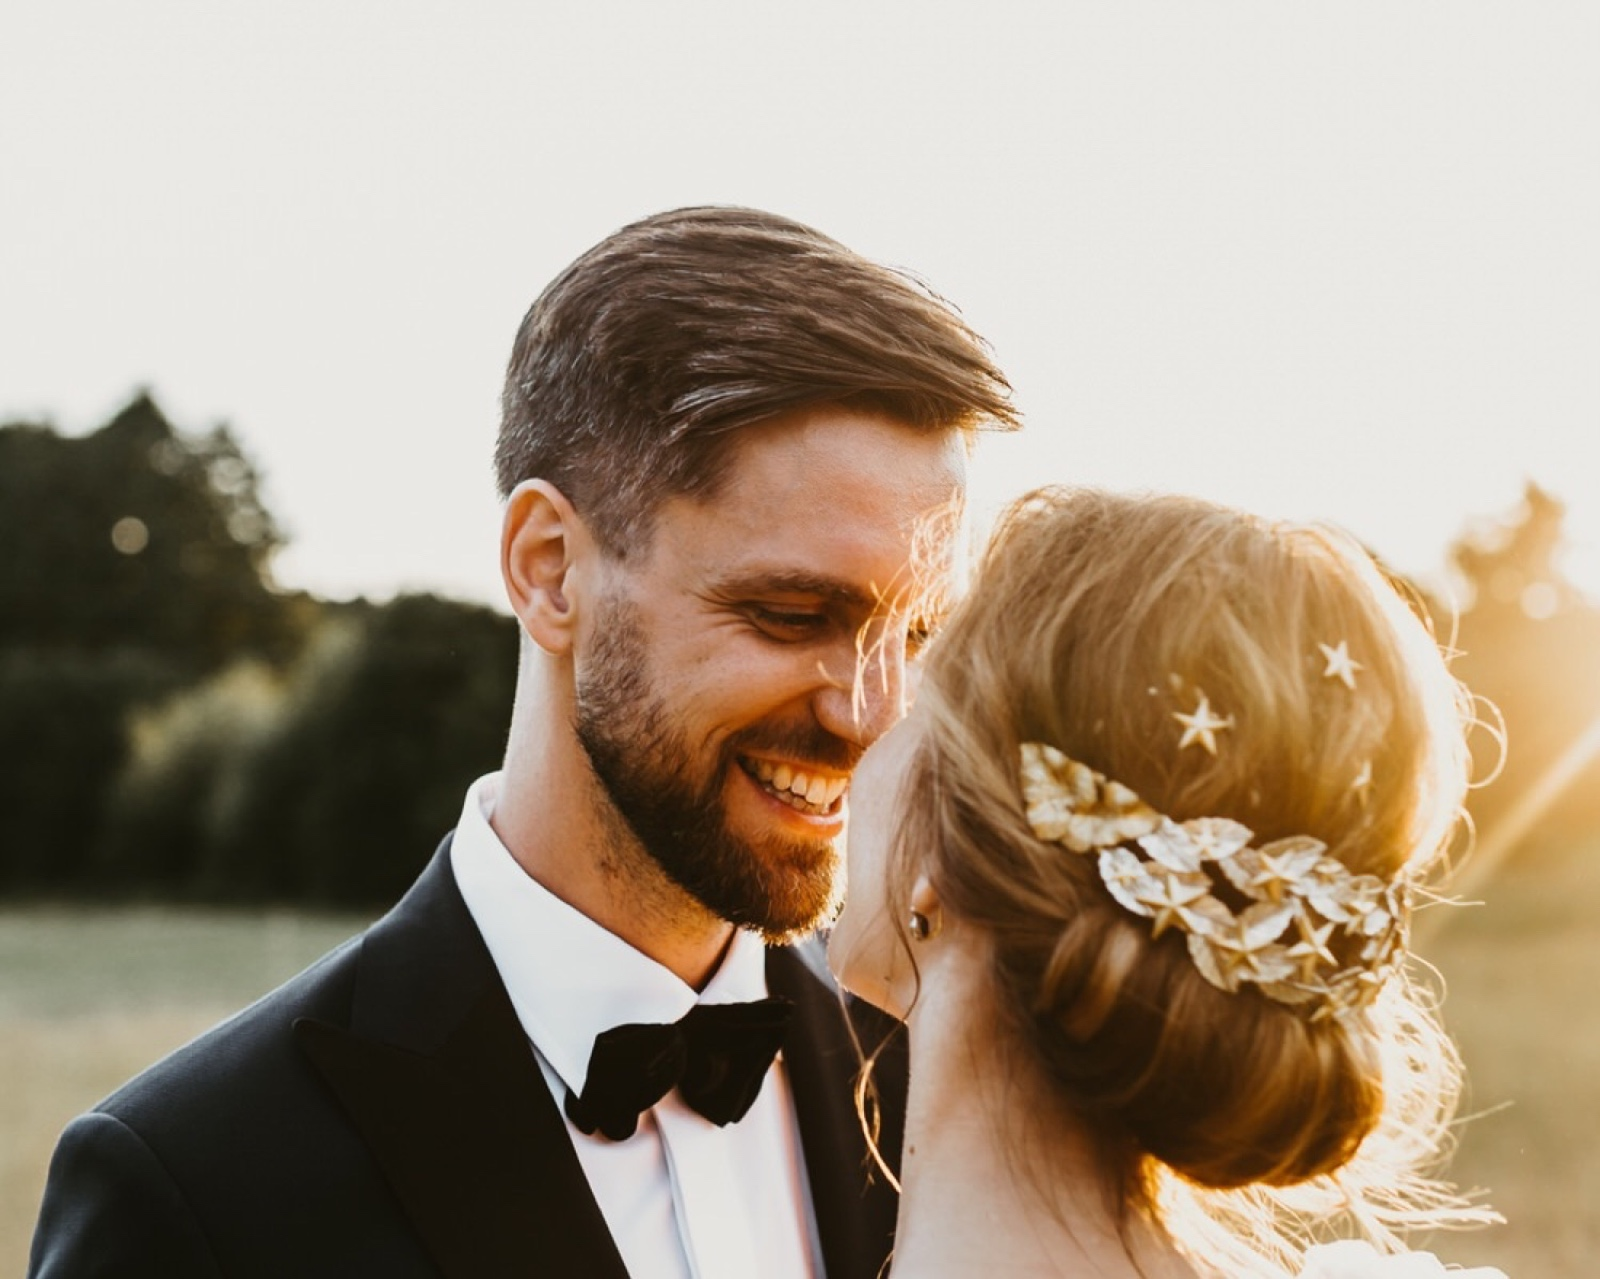 Fotomagoria Best 0f 2018 Wedding Photographer Italy16.jpg